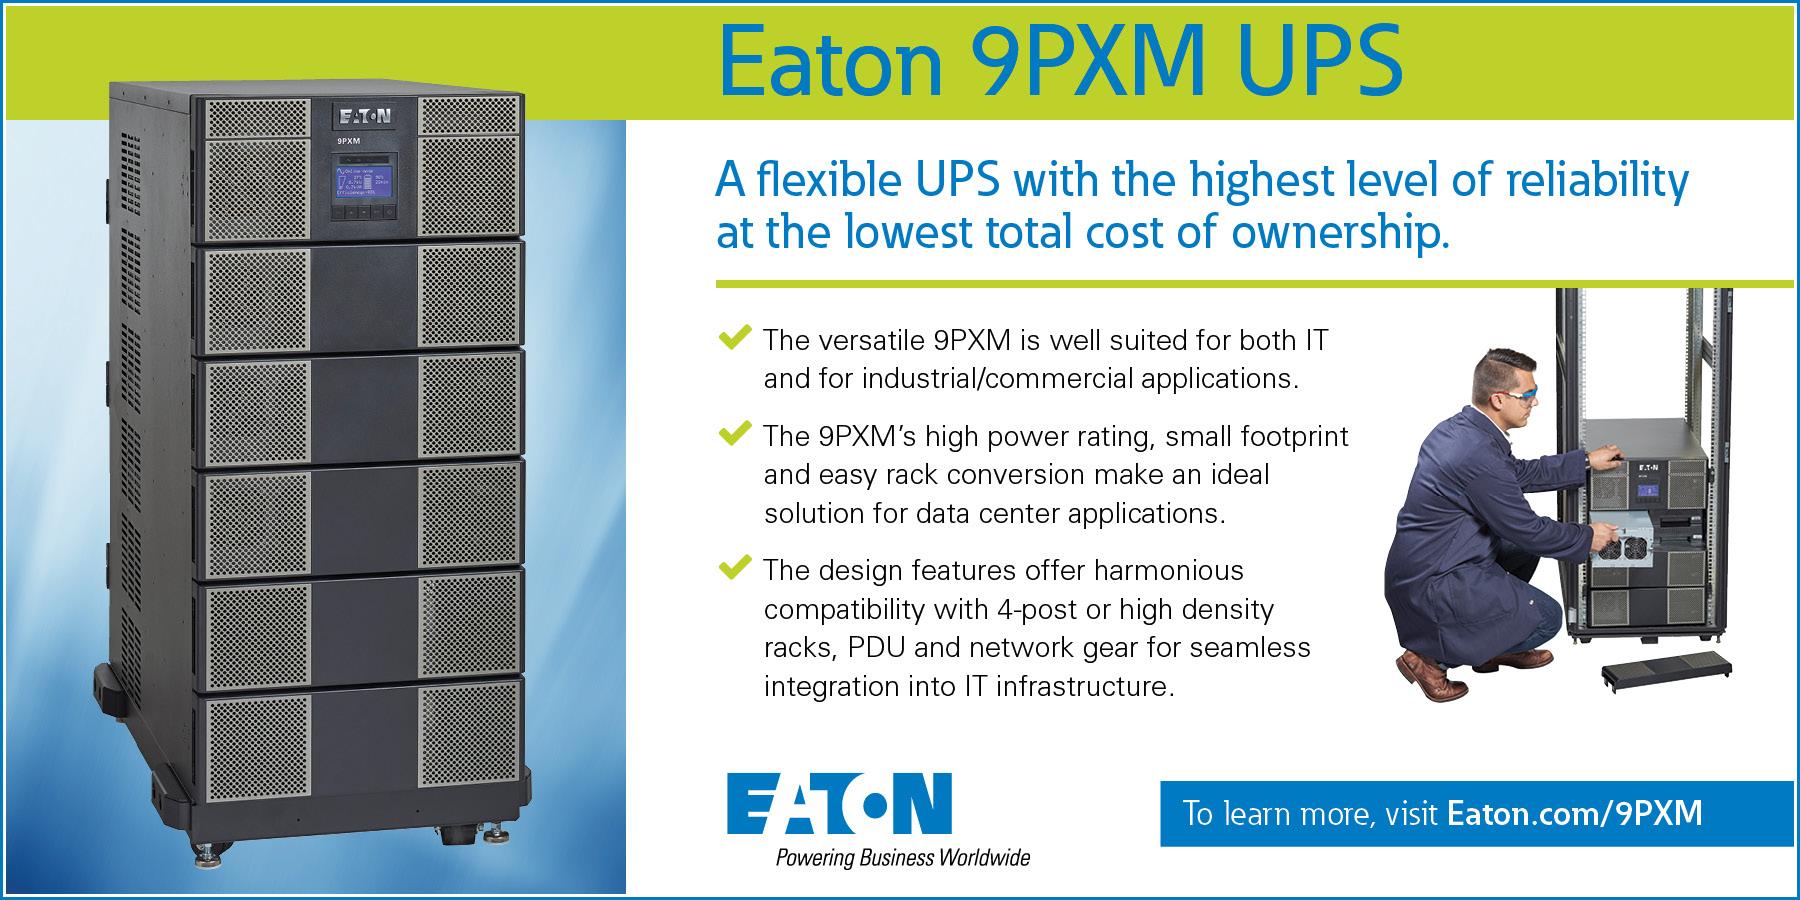 Eaton 9PXM Digital Signage